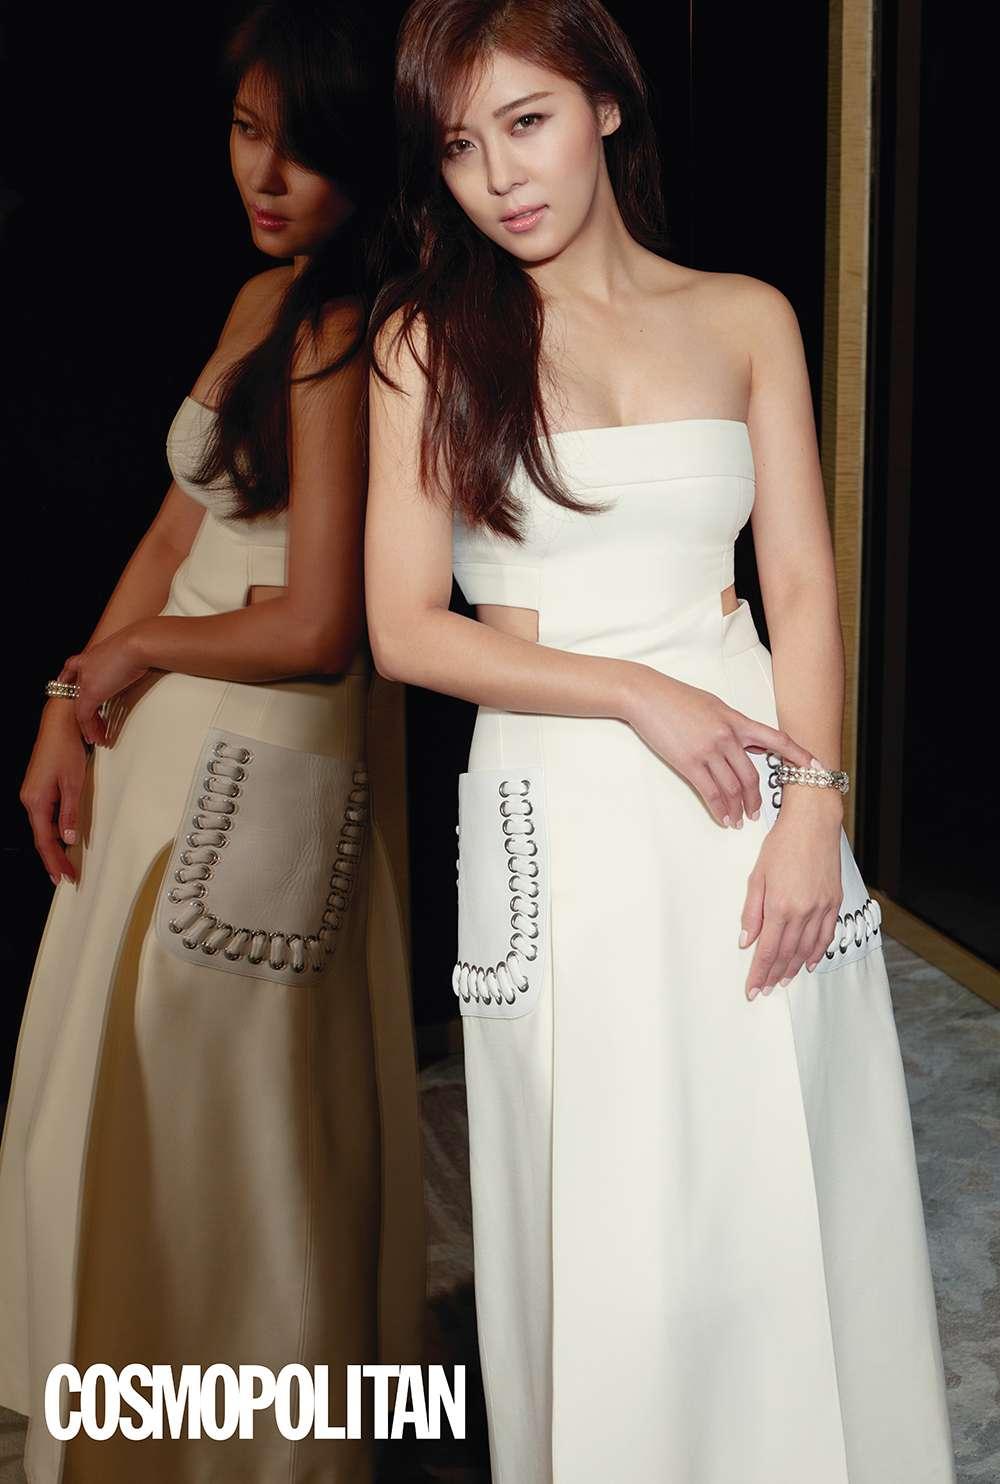 ha ji won covers cosmopolitan hong kong�s march 2016 issue